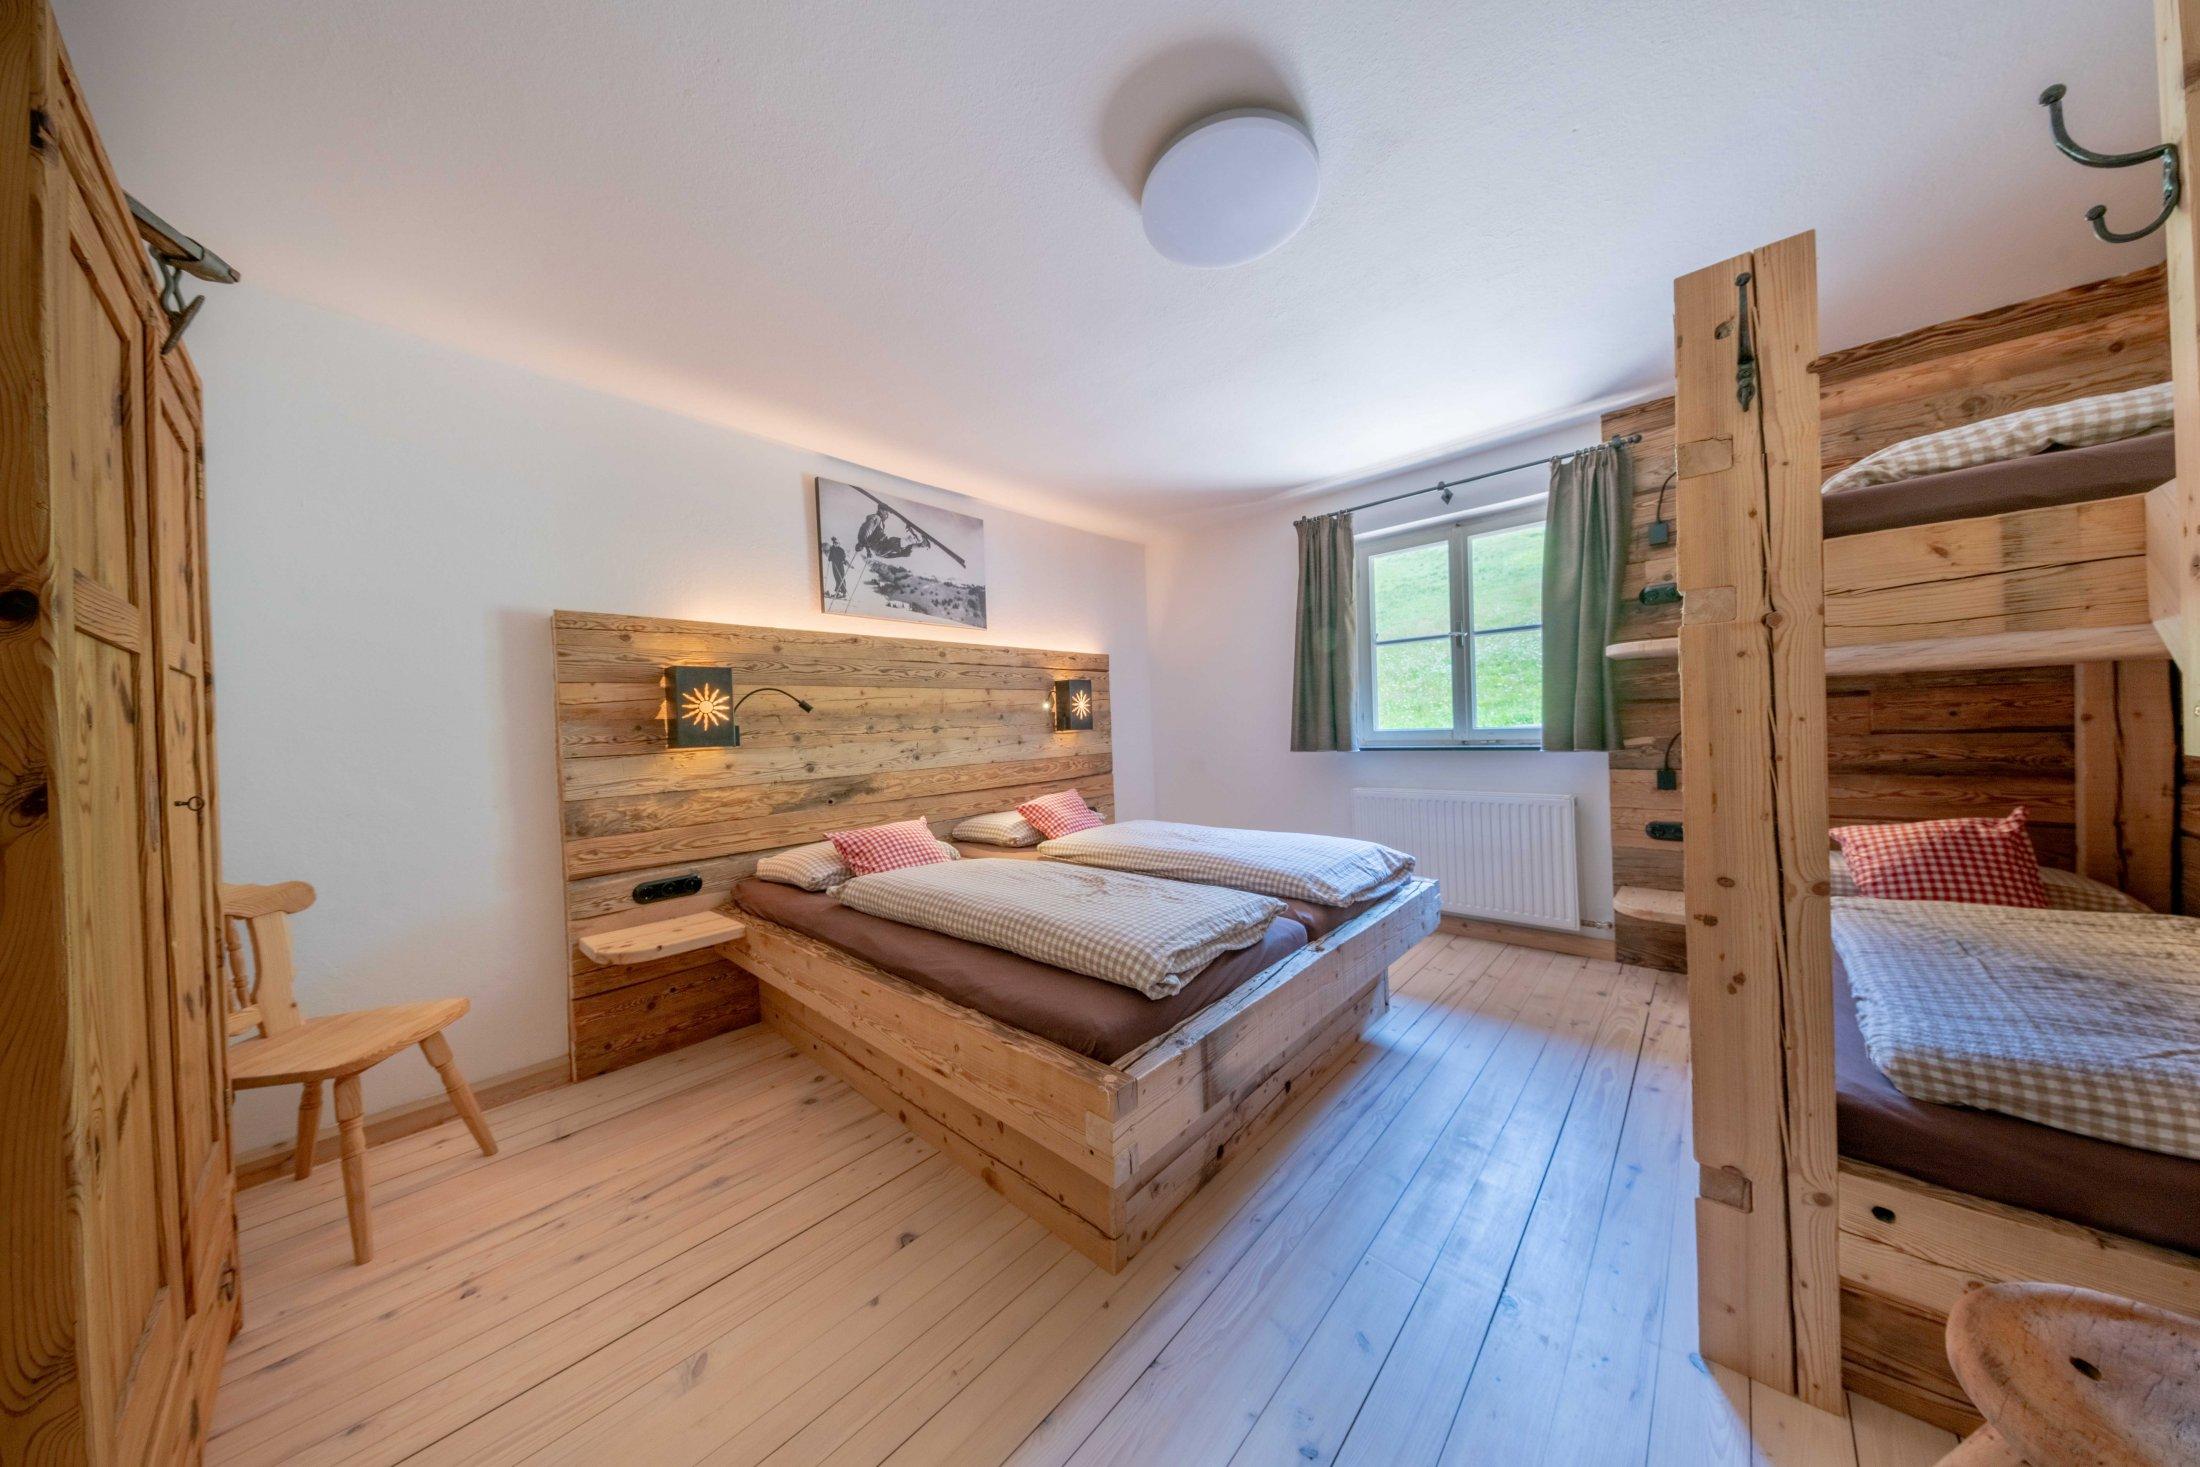 Schlafzimmer im Ergeschoss